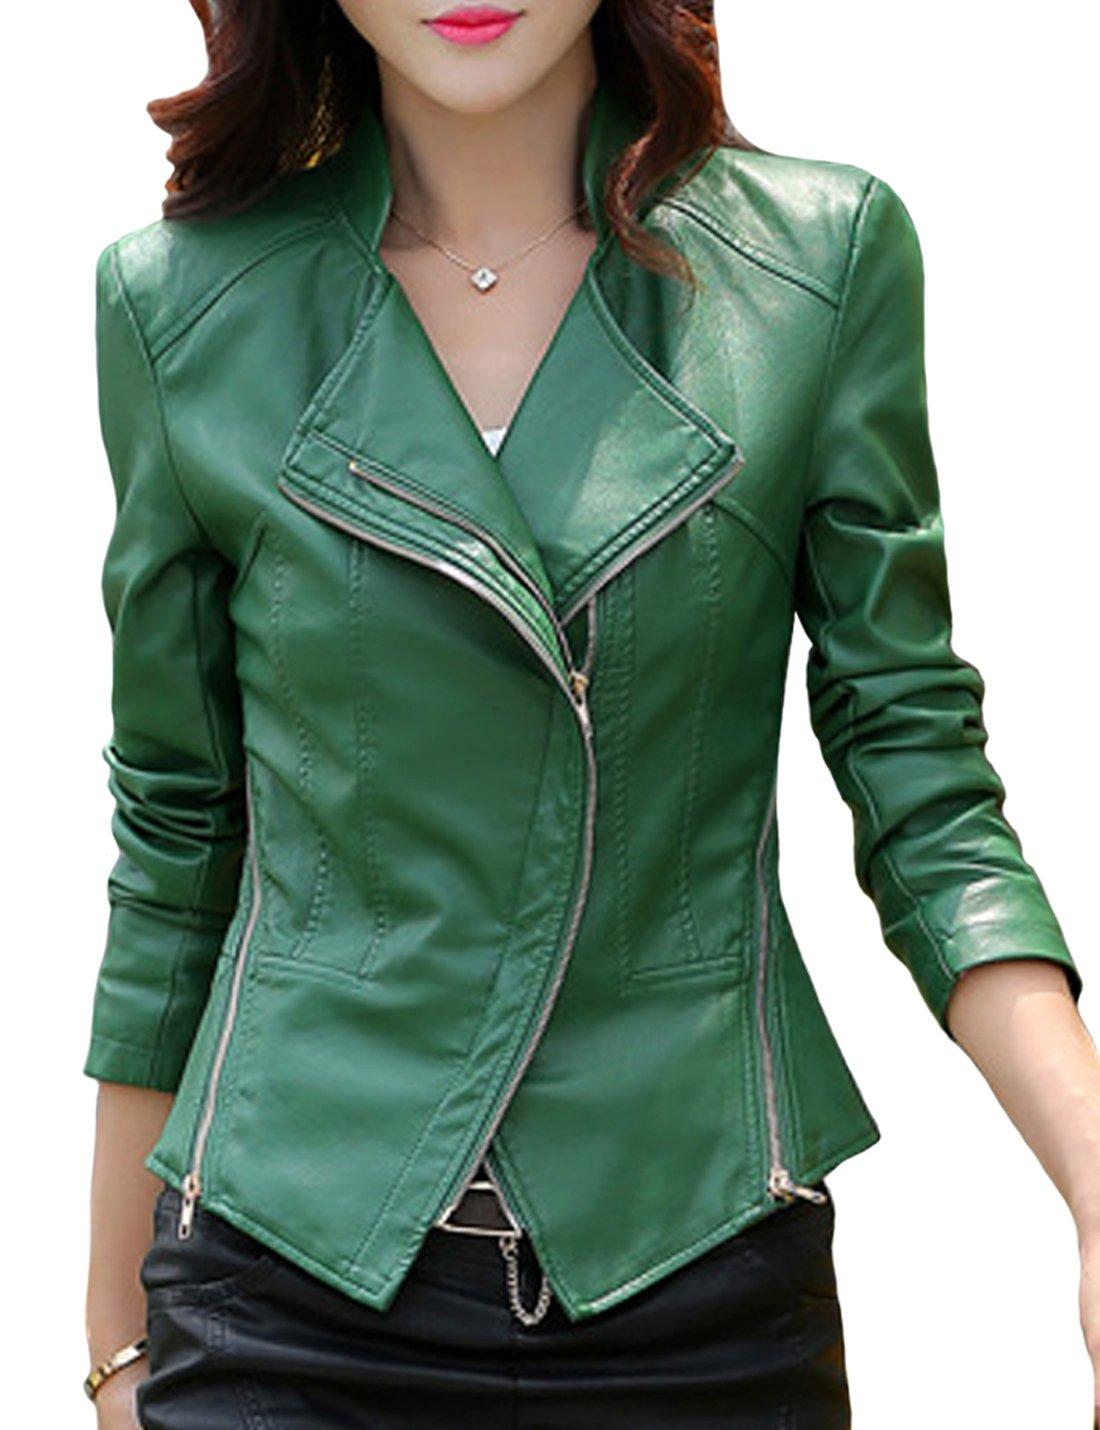 0325a42b986 Tanming Women s Short Slim Slant Zip Faux Leather Moto Jacket Multiple  Colors (Medium